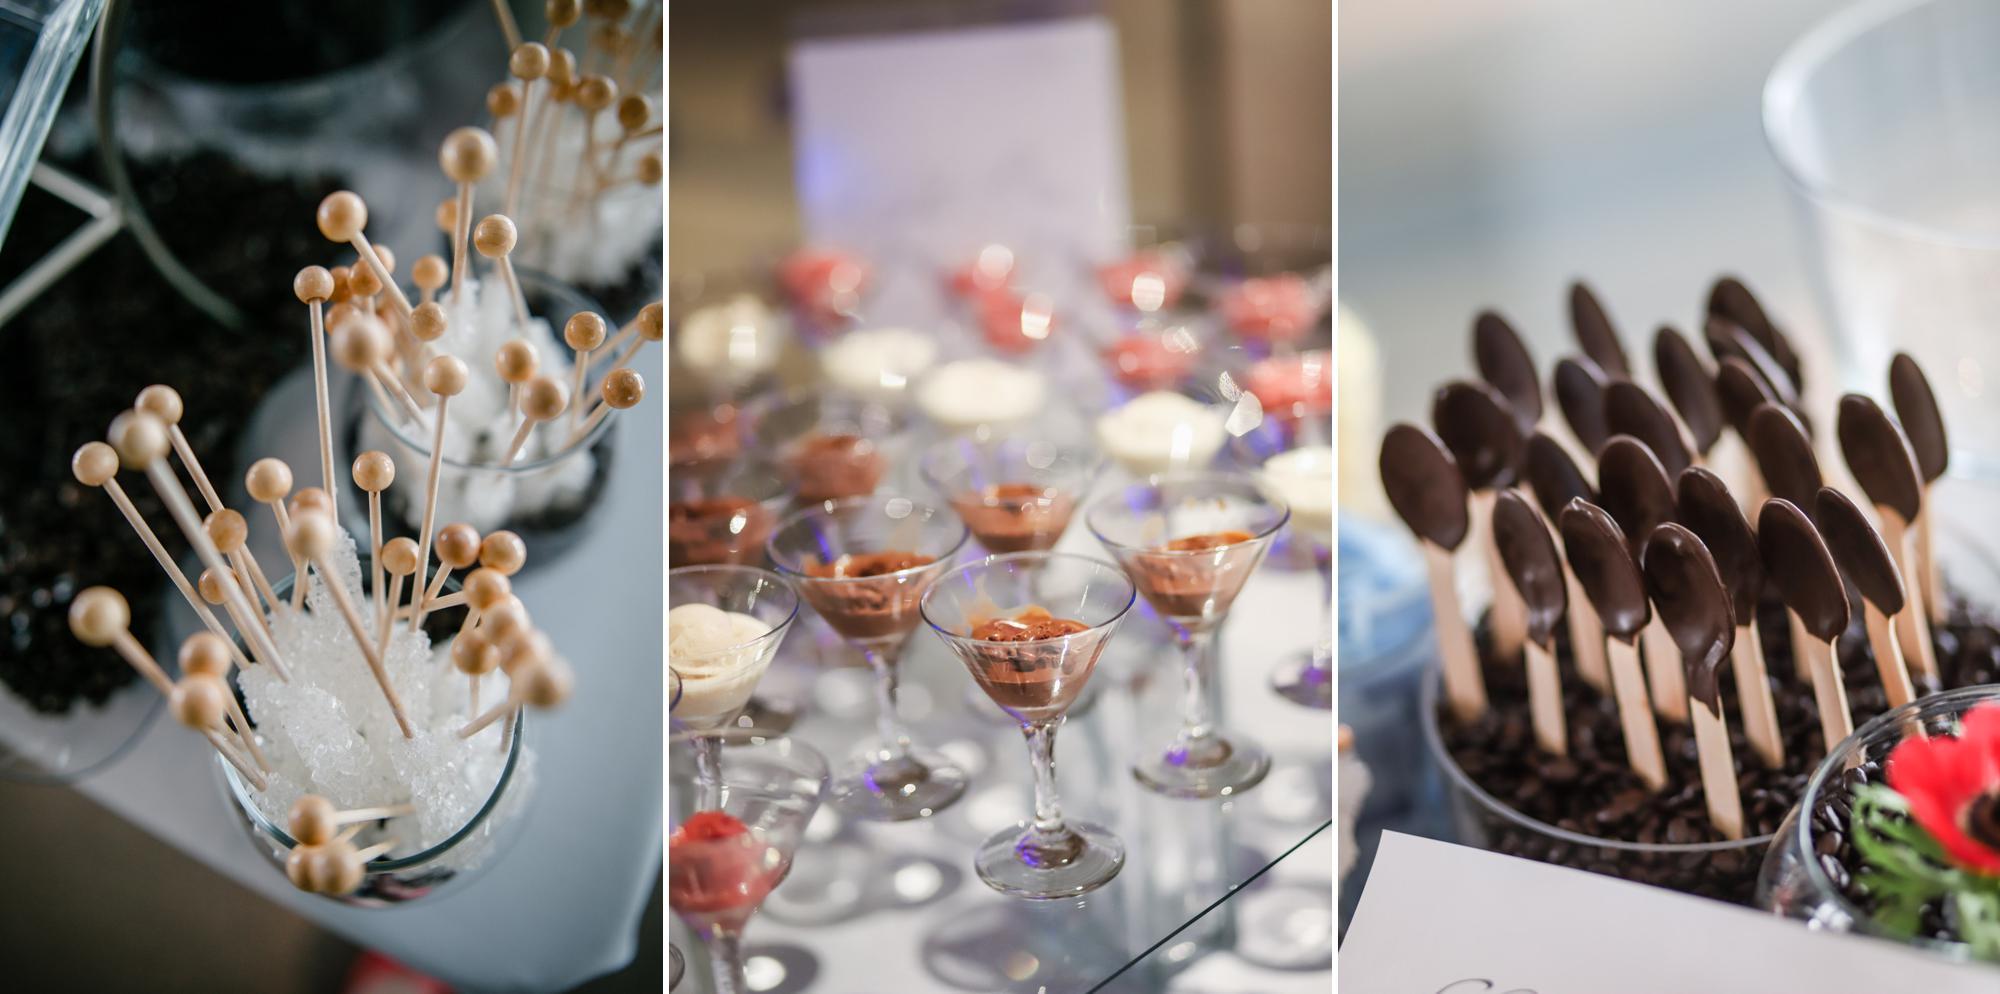 toledo-museum-glass-pavilion-wedding-photos-20.jpg